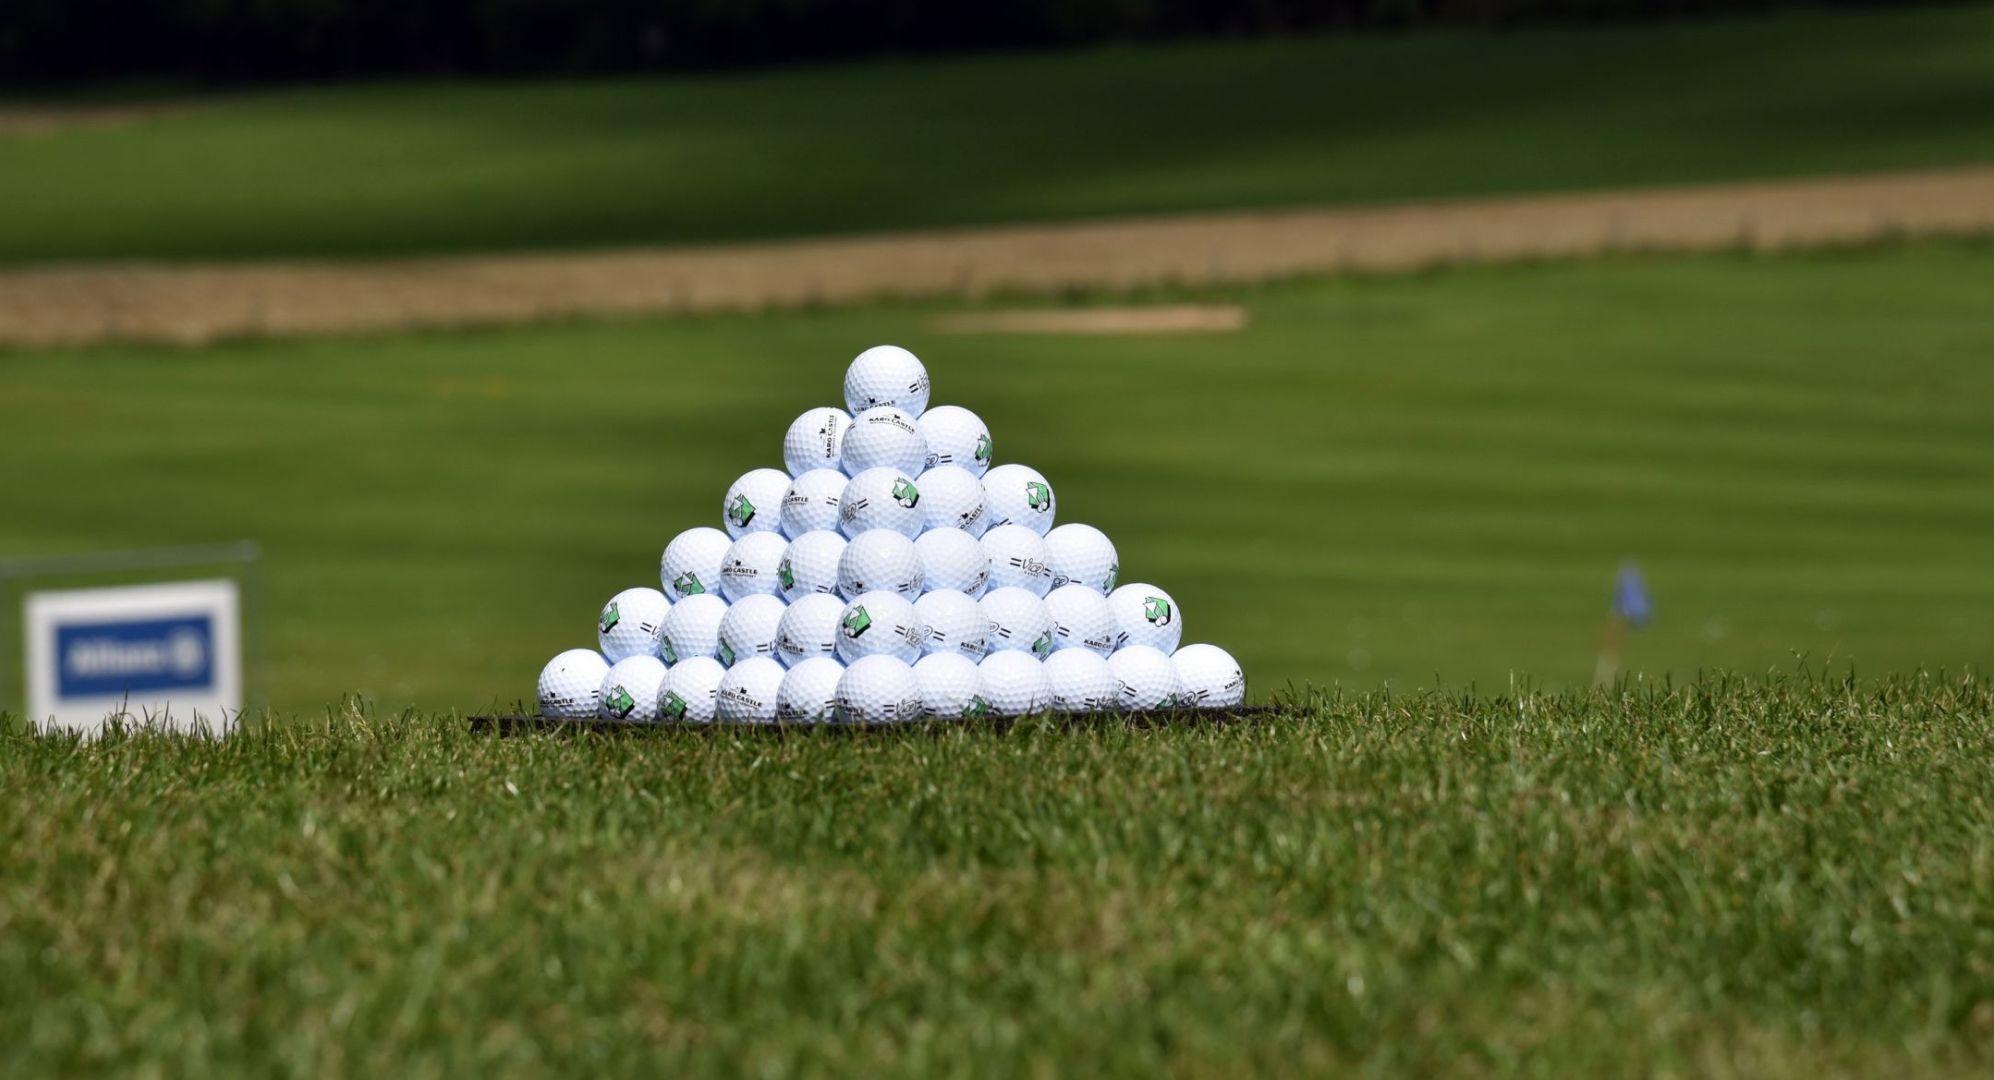 Golfplatz in Feldkirchen-Westerham